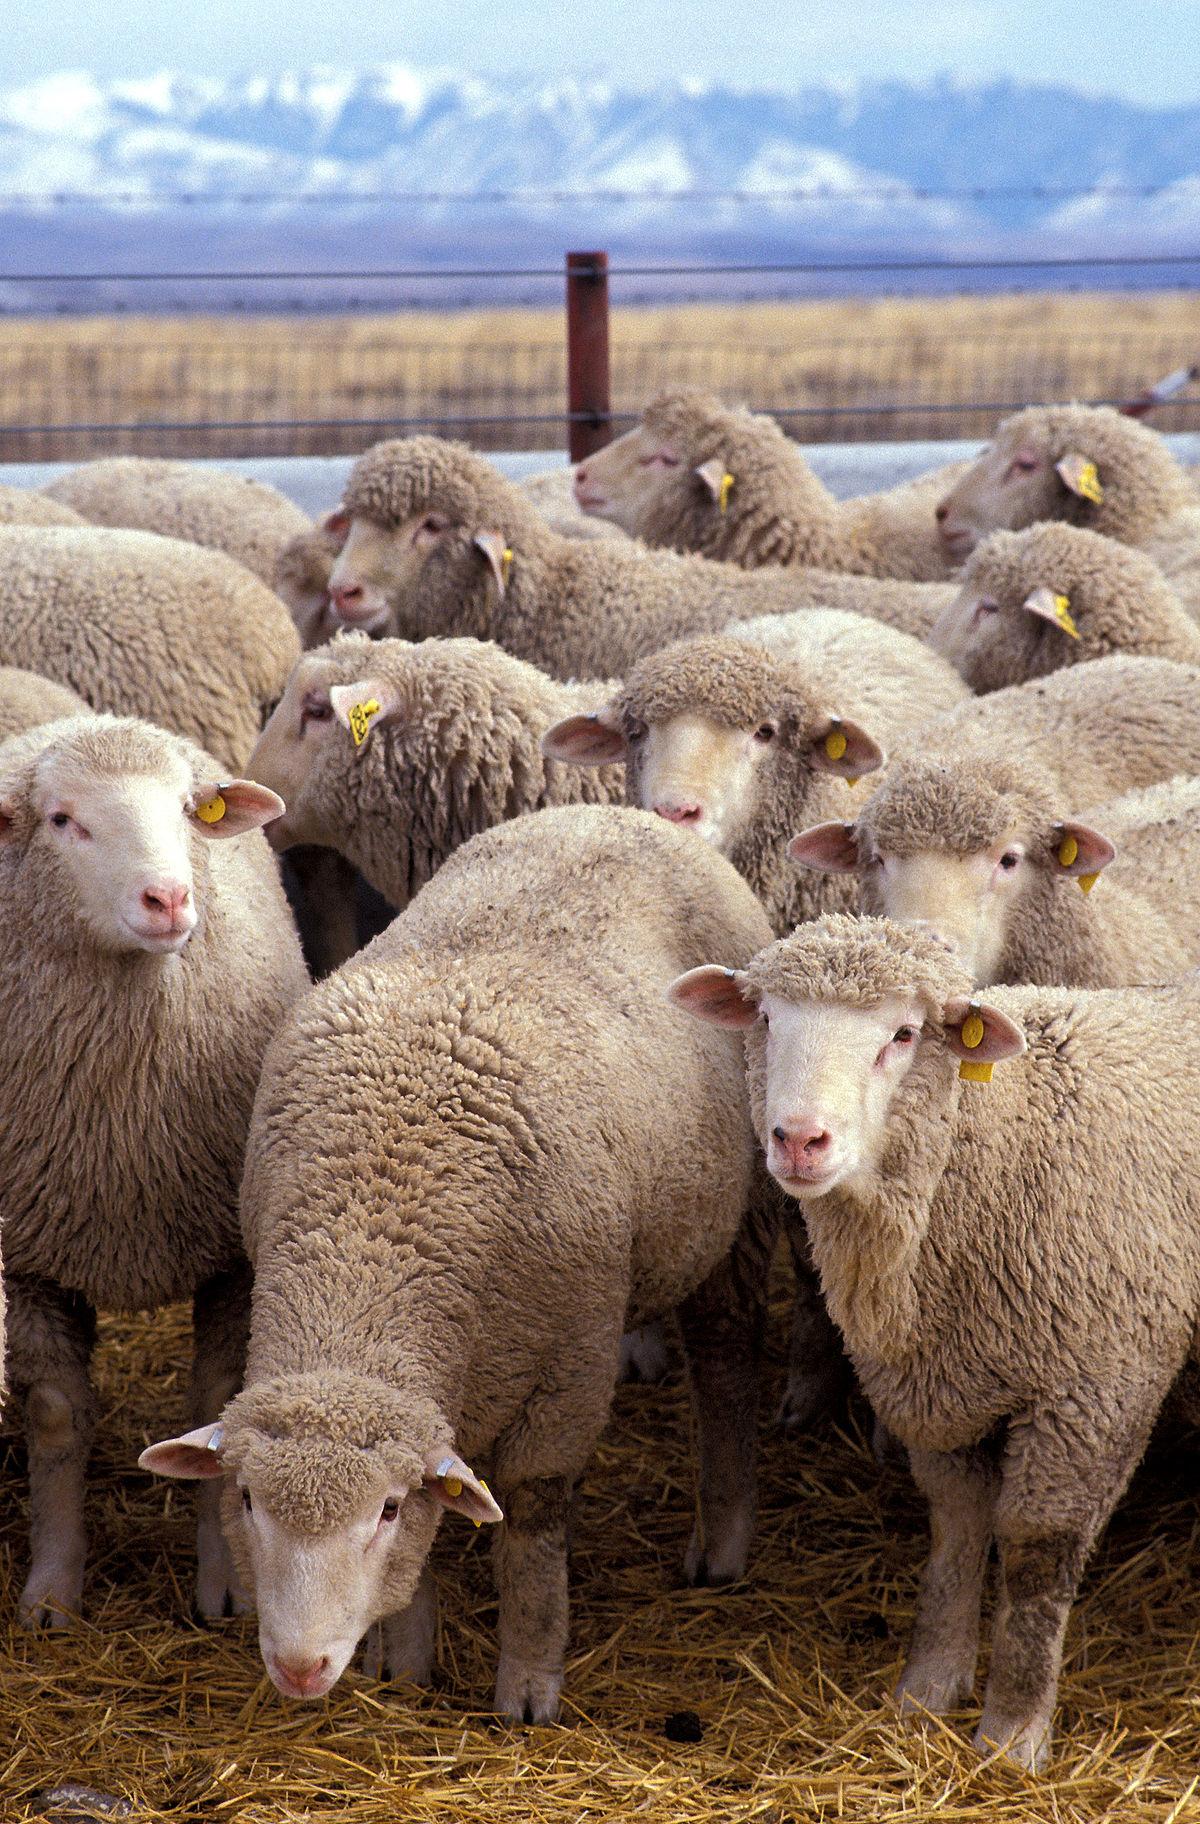 Sheep   Wikipedia regarding Gambar Domba Dorset